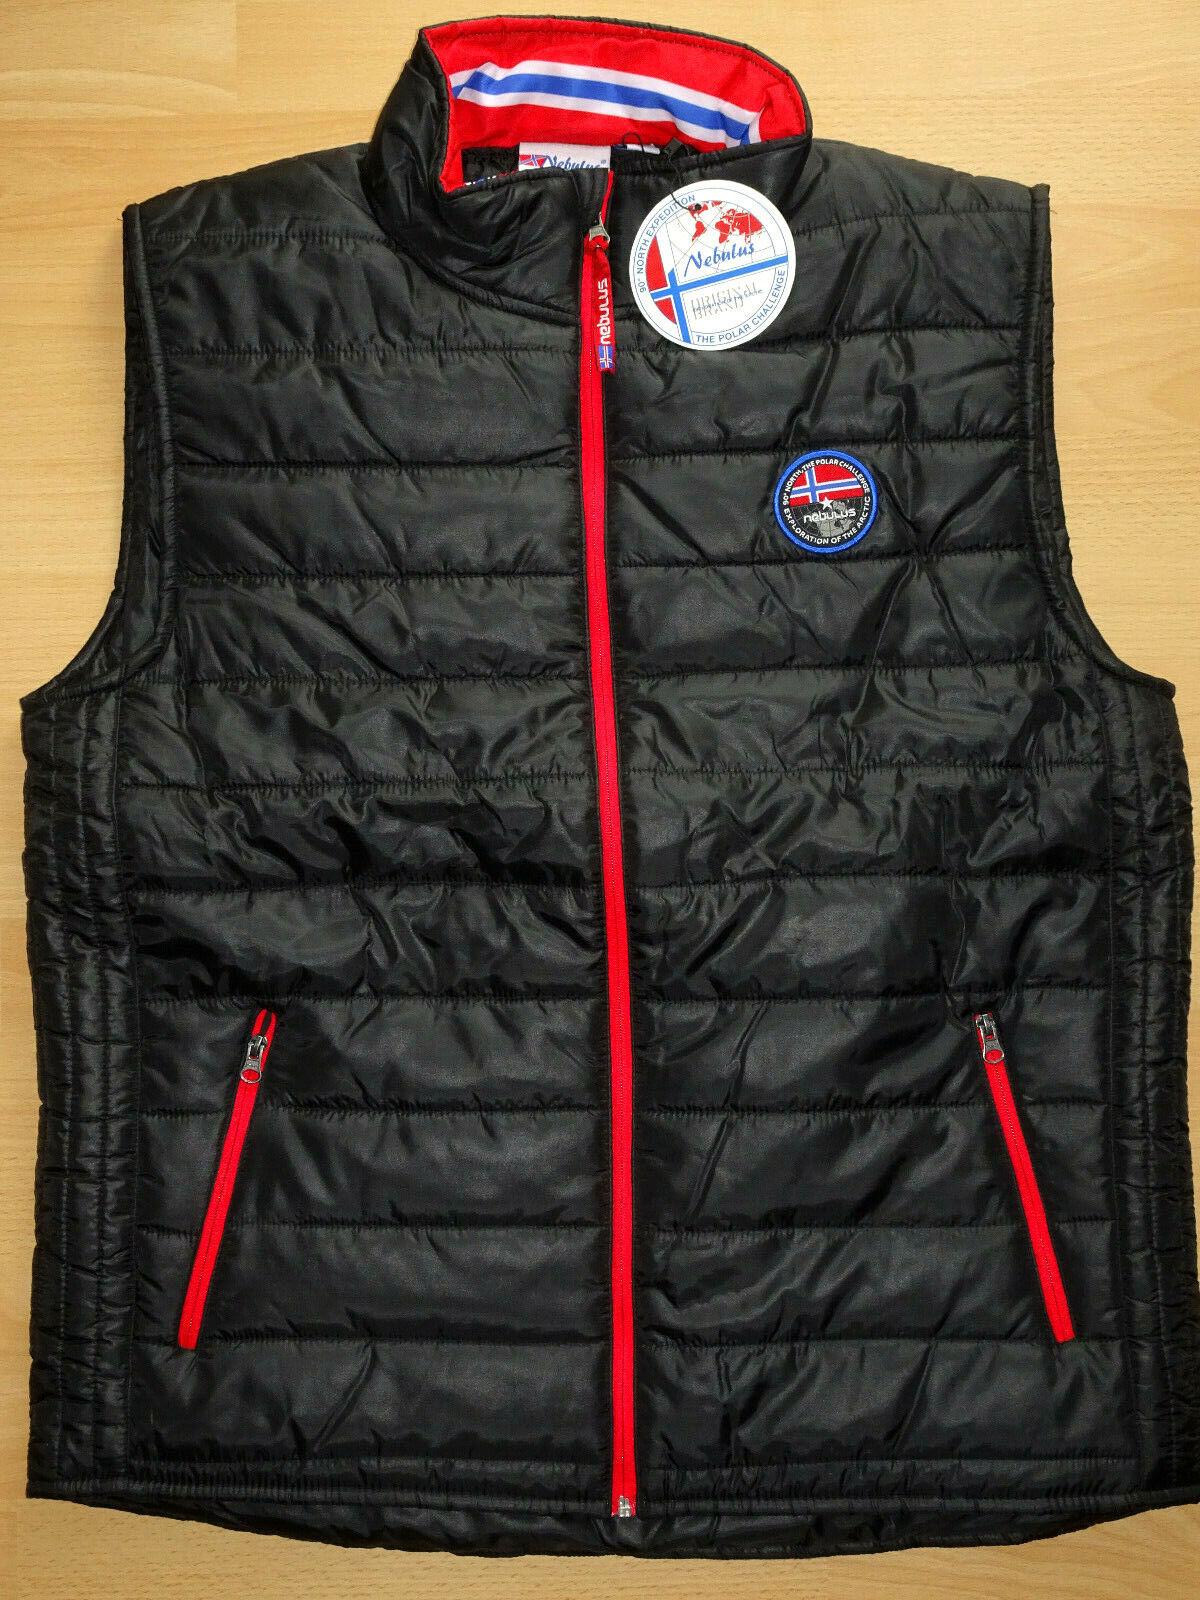 Caballeros Nebulus estupendos chaleco negro en daunenoptik chaqueta en talla m nuevo